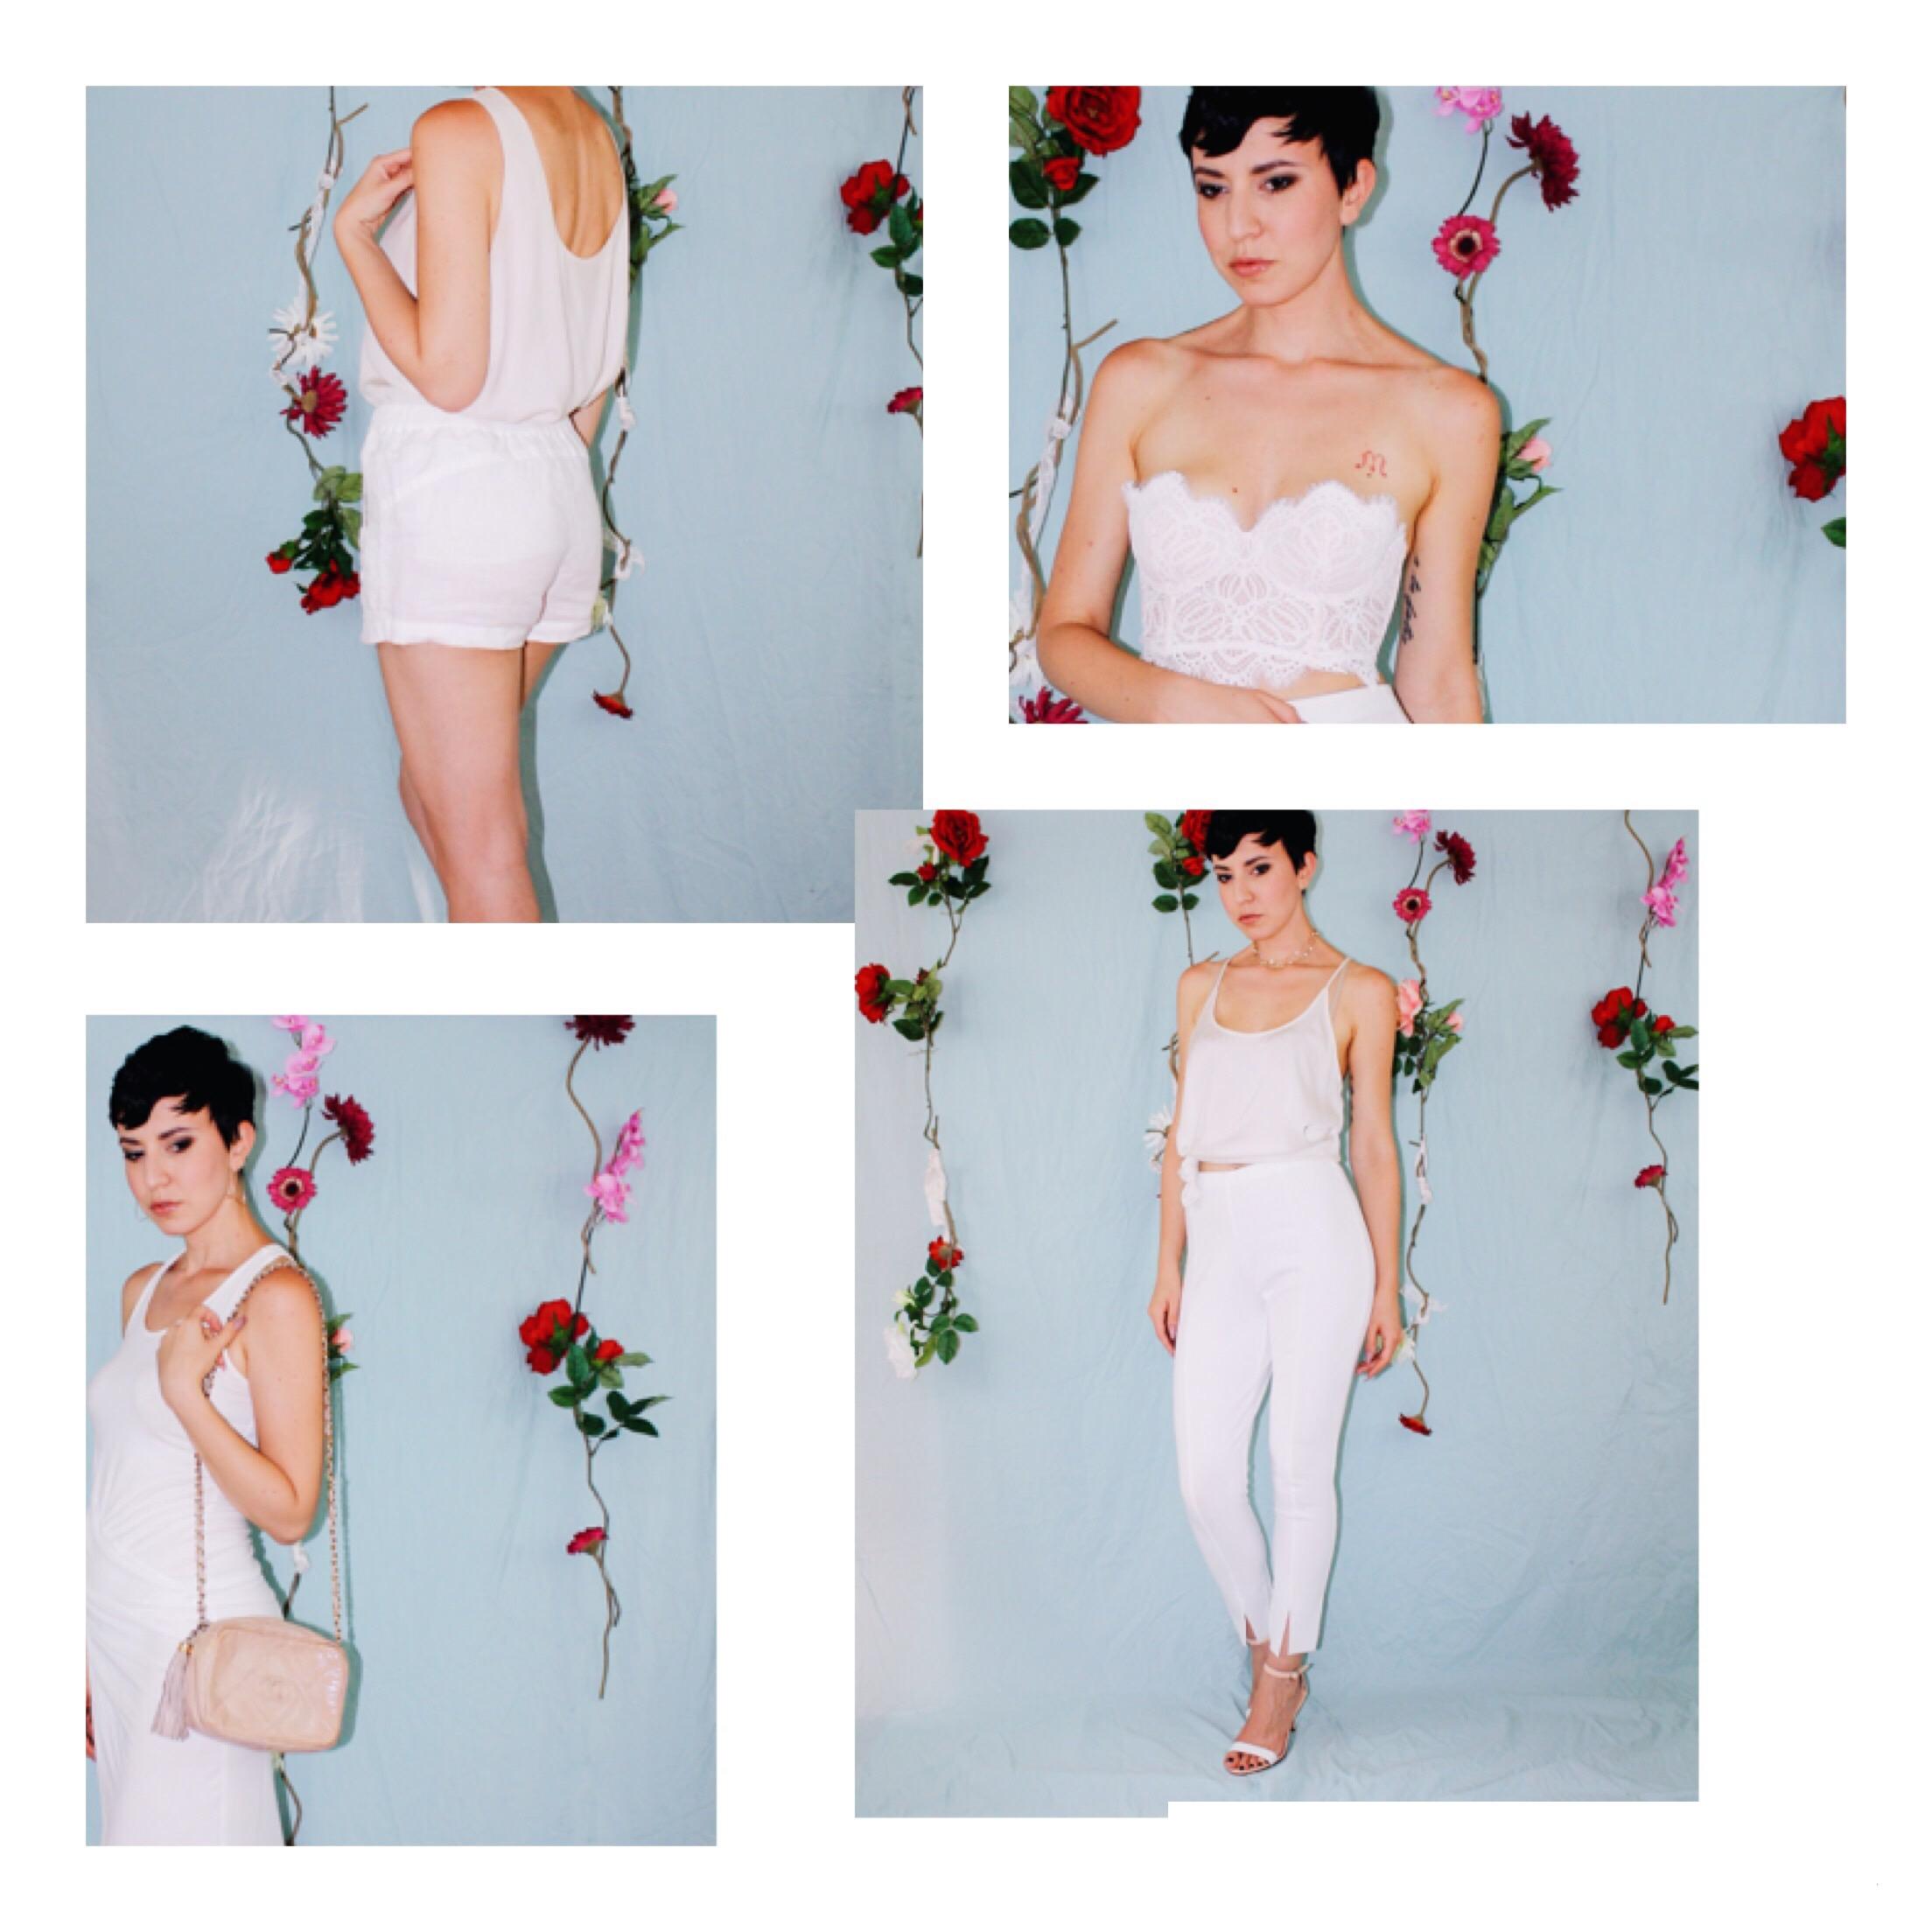 labor day outfit ideas white leggings silk tank lace boustier linen shorts dress 8